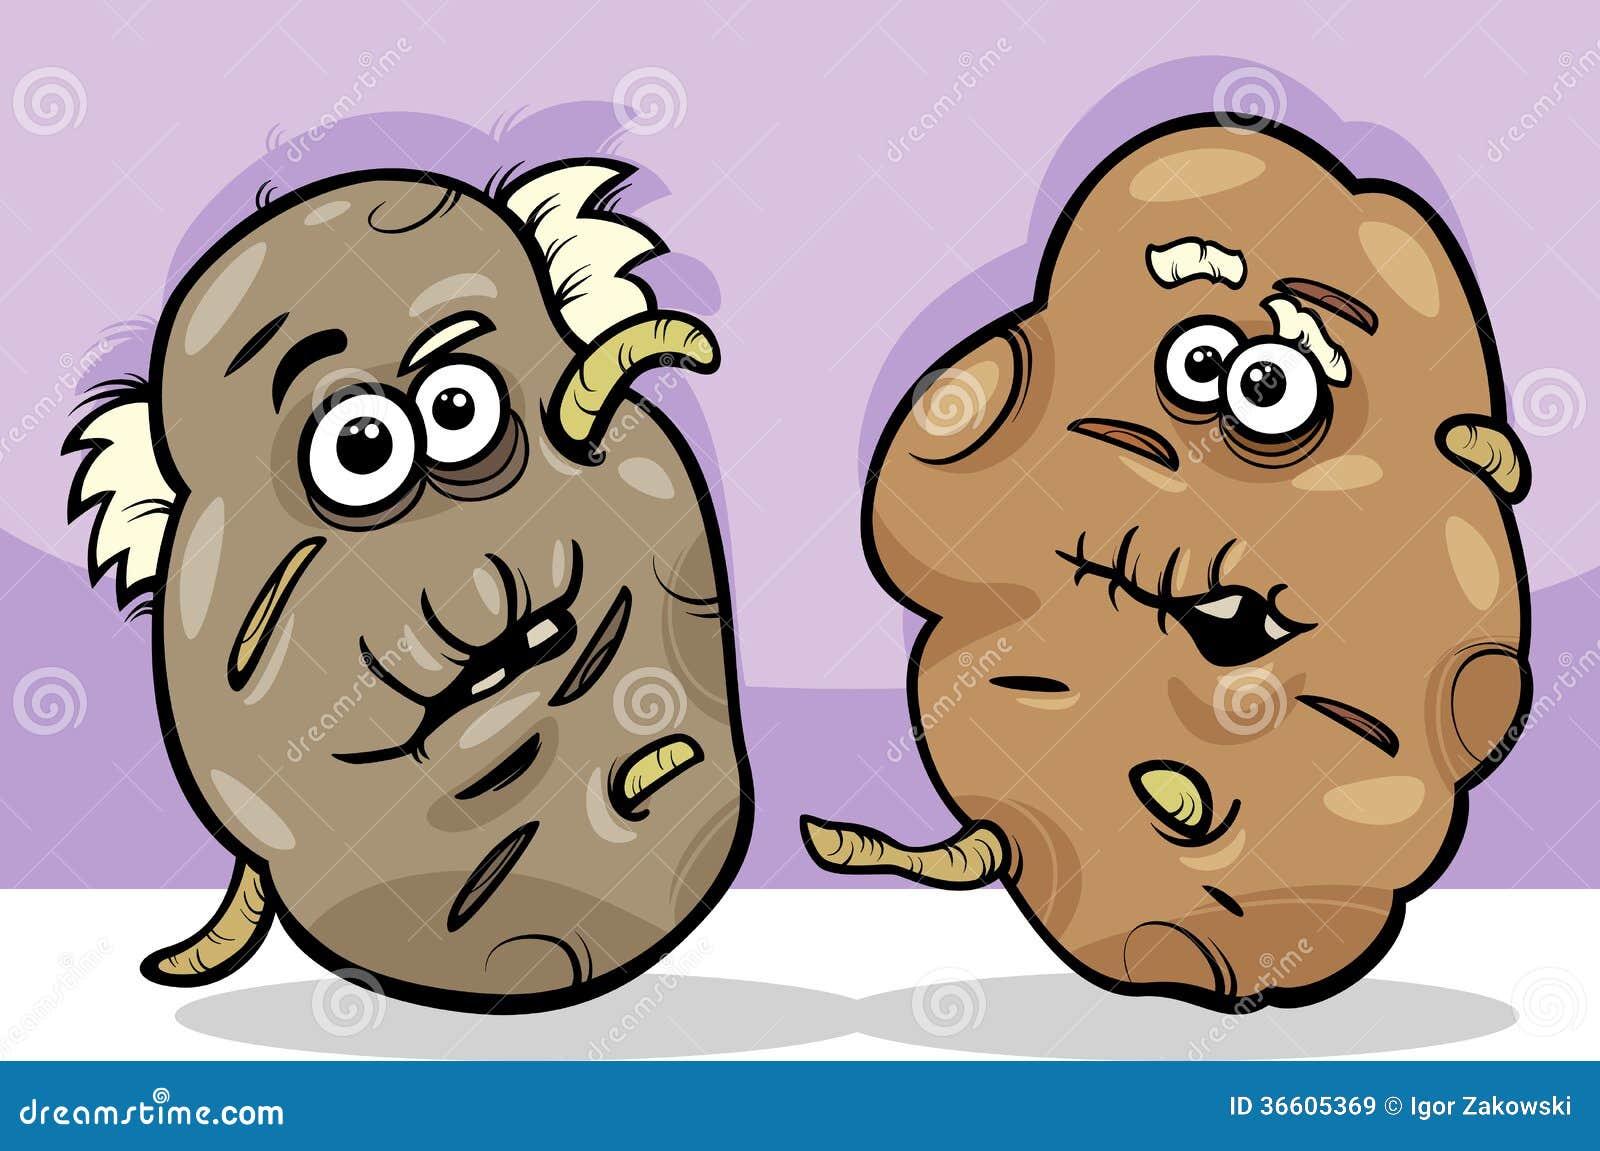 Cartoon Potatoes Without Faces